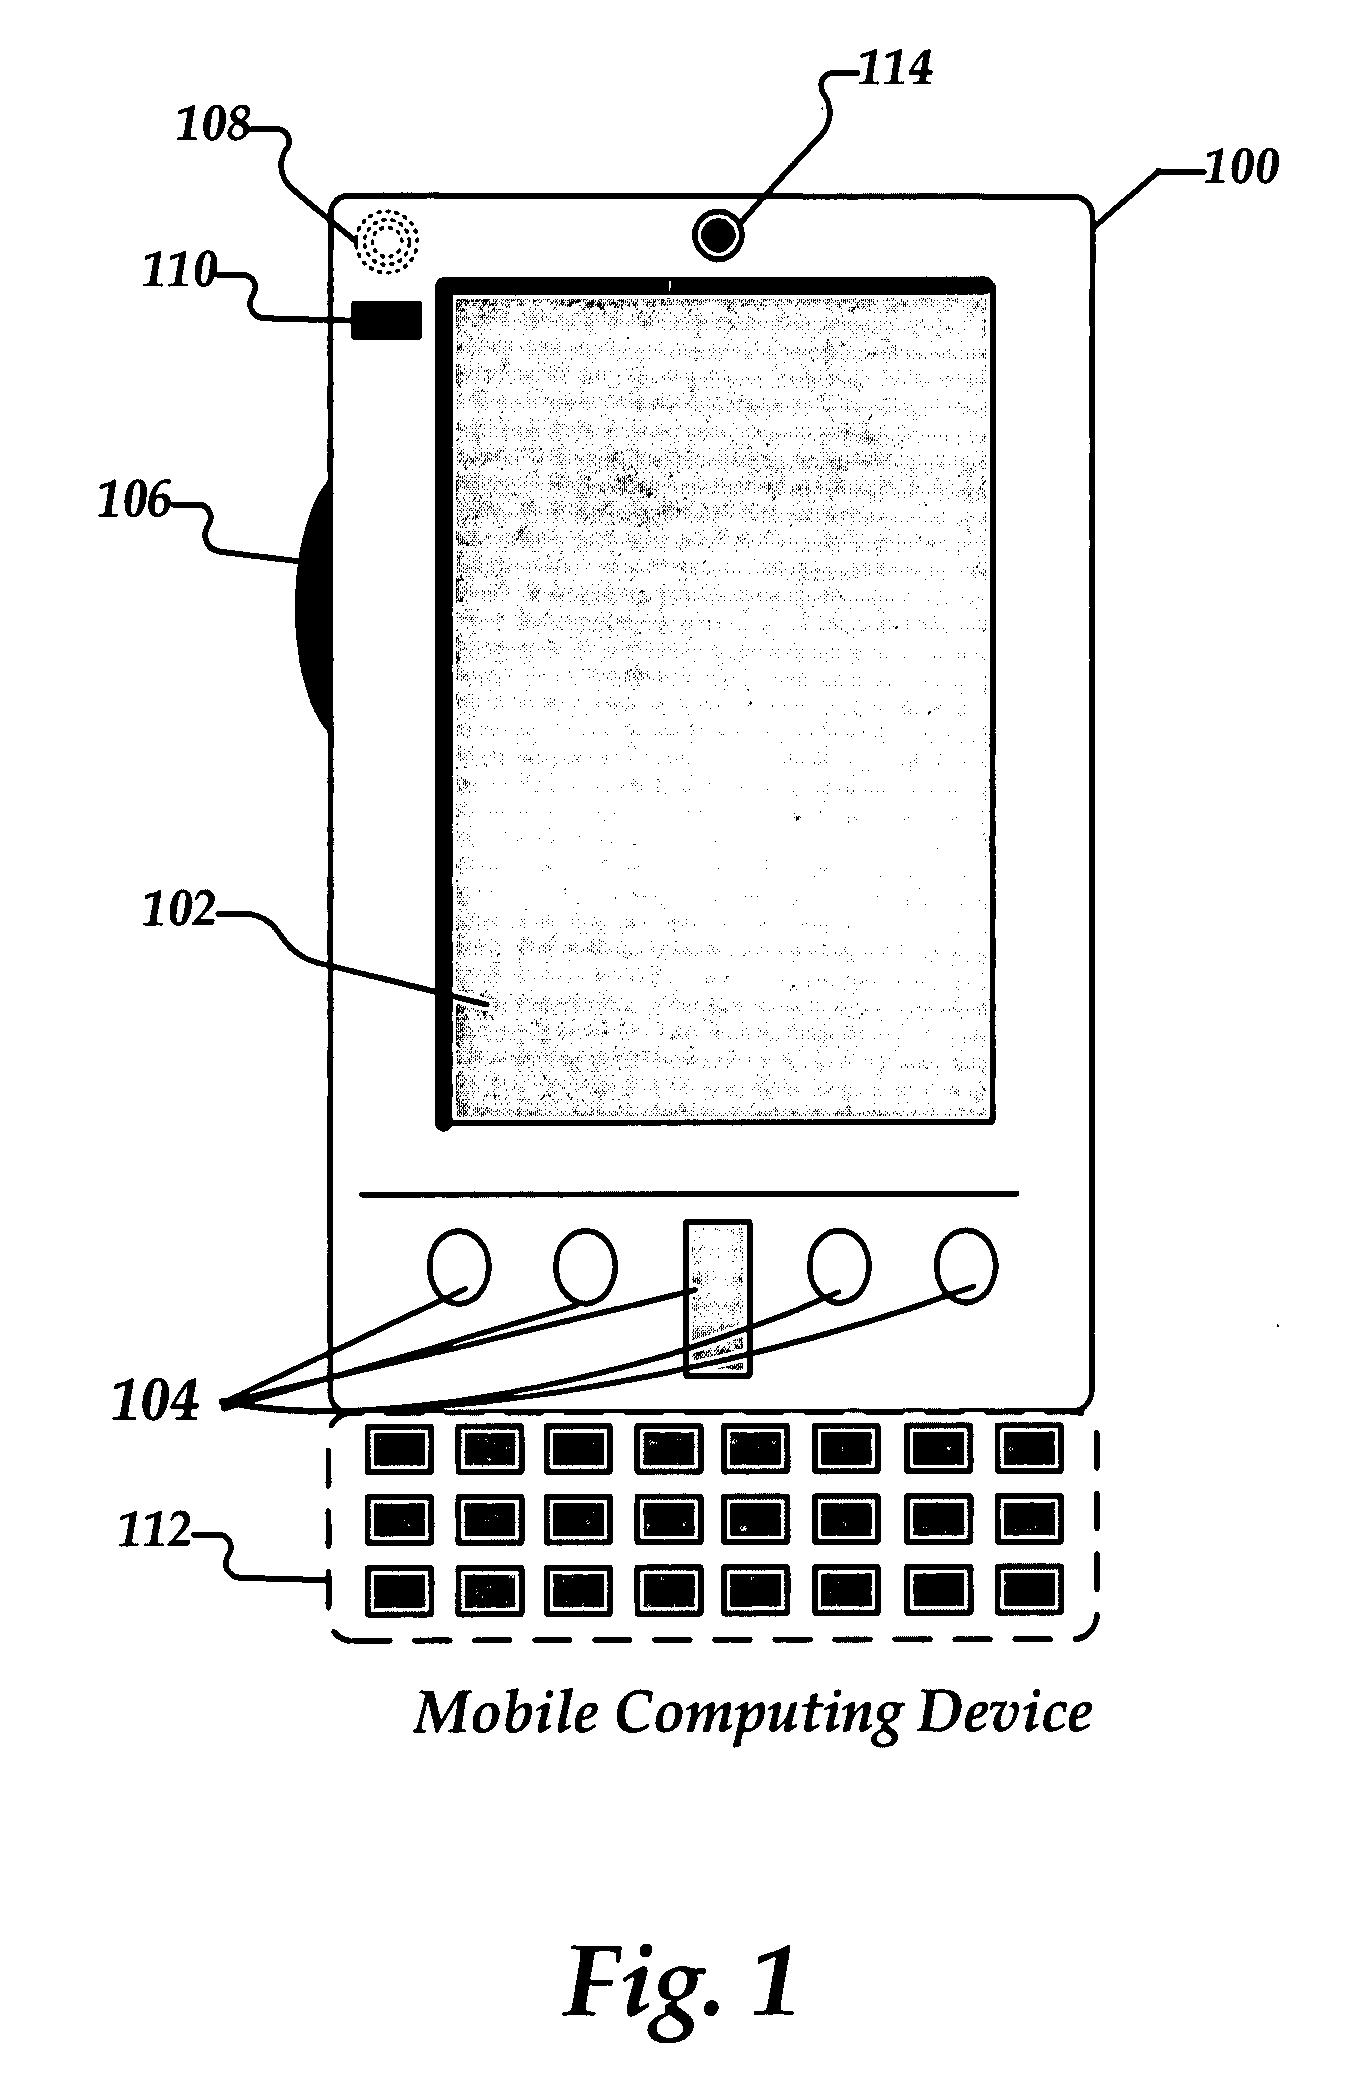 telstra mobile call forwarding instructions